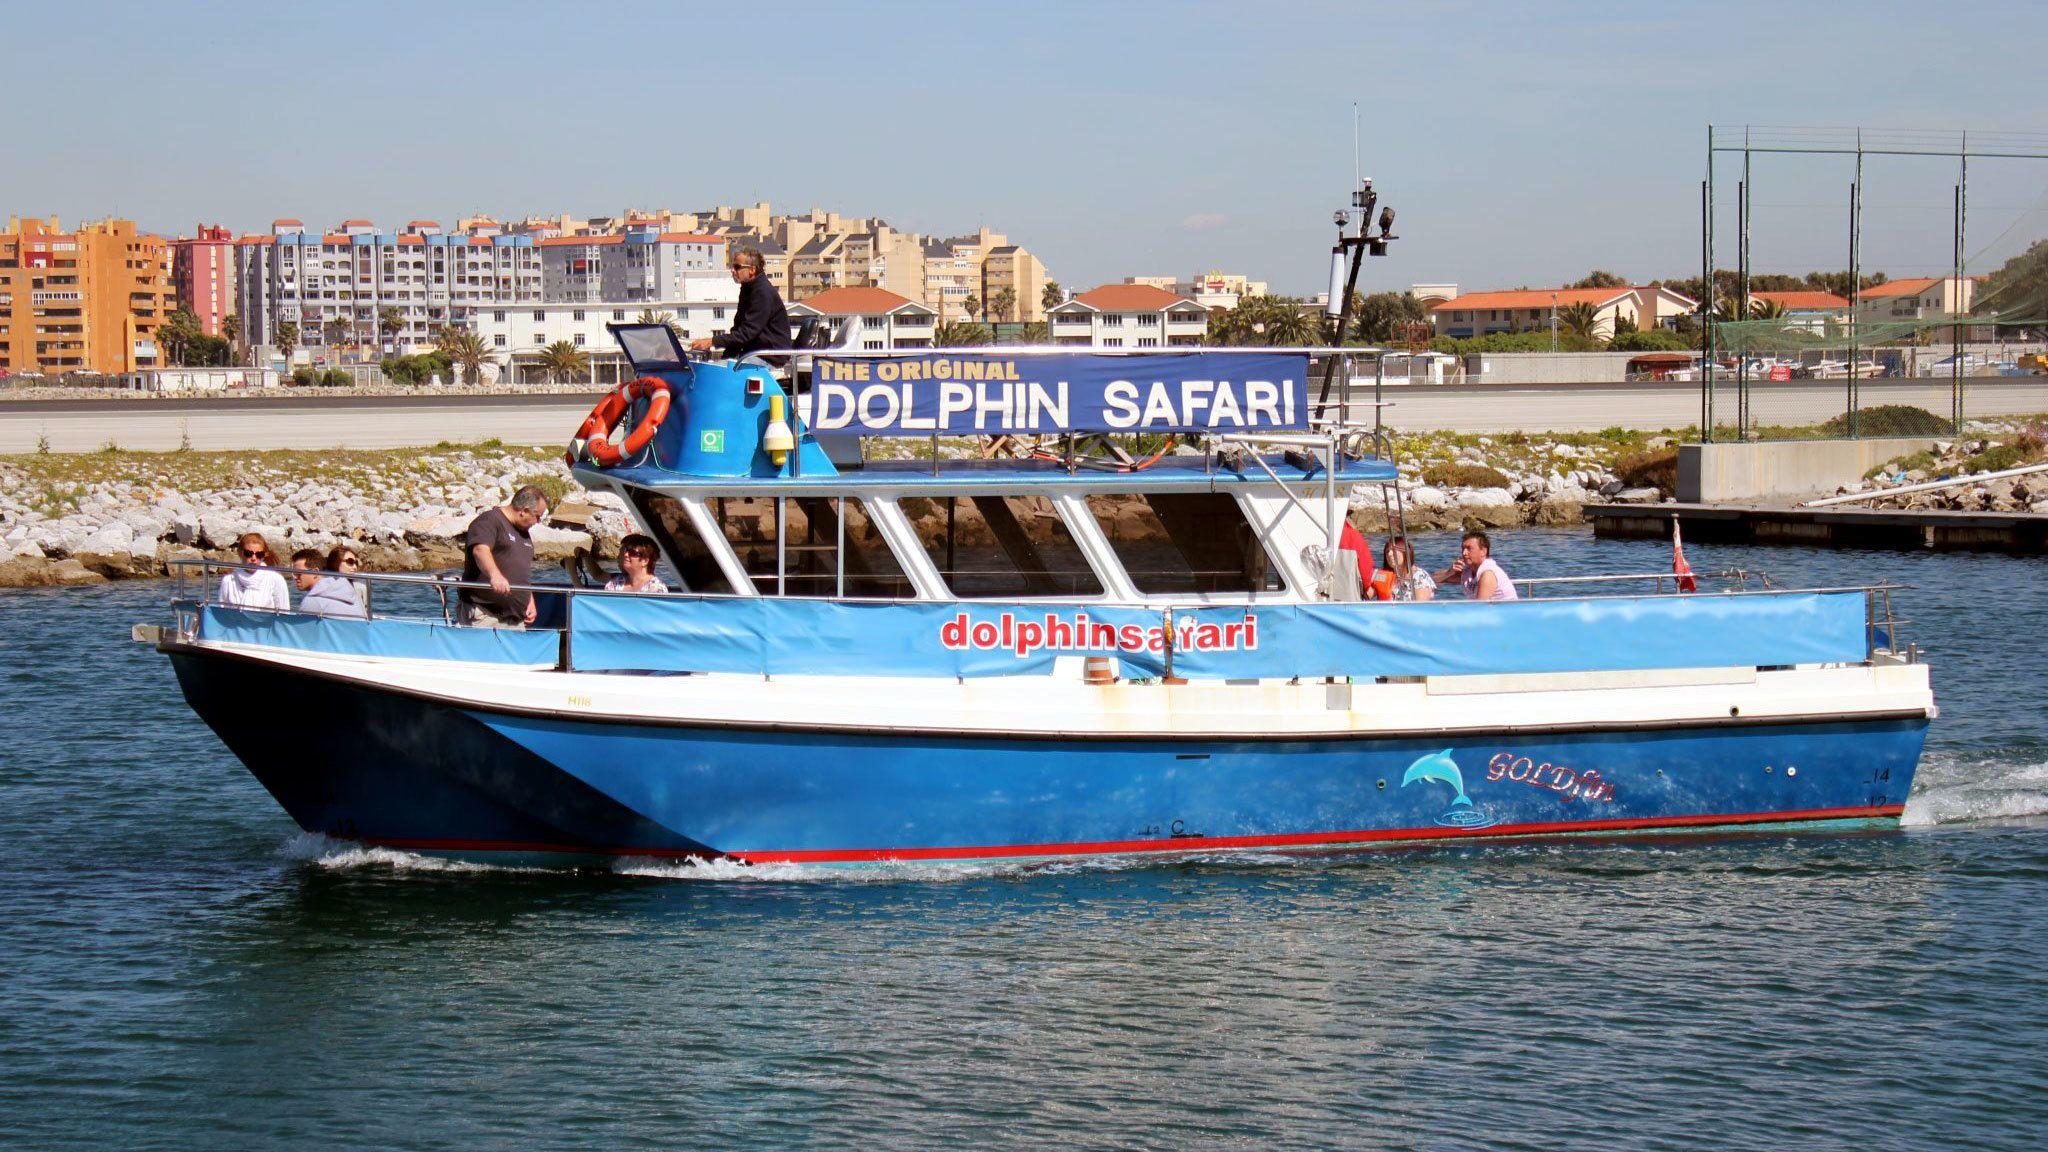 aboard the dolphin safari cruise in Malaga